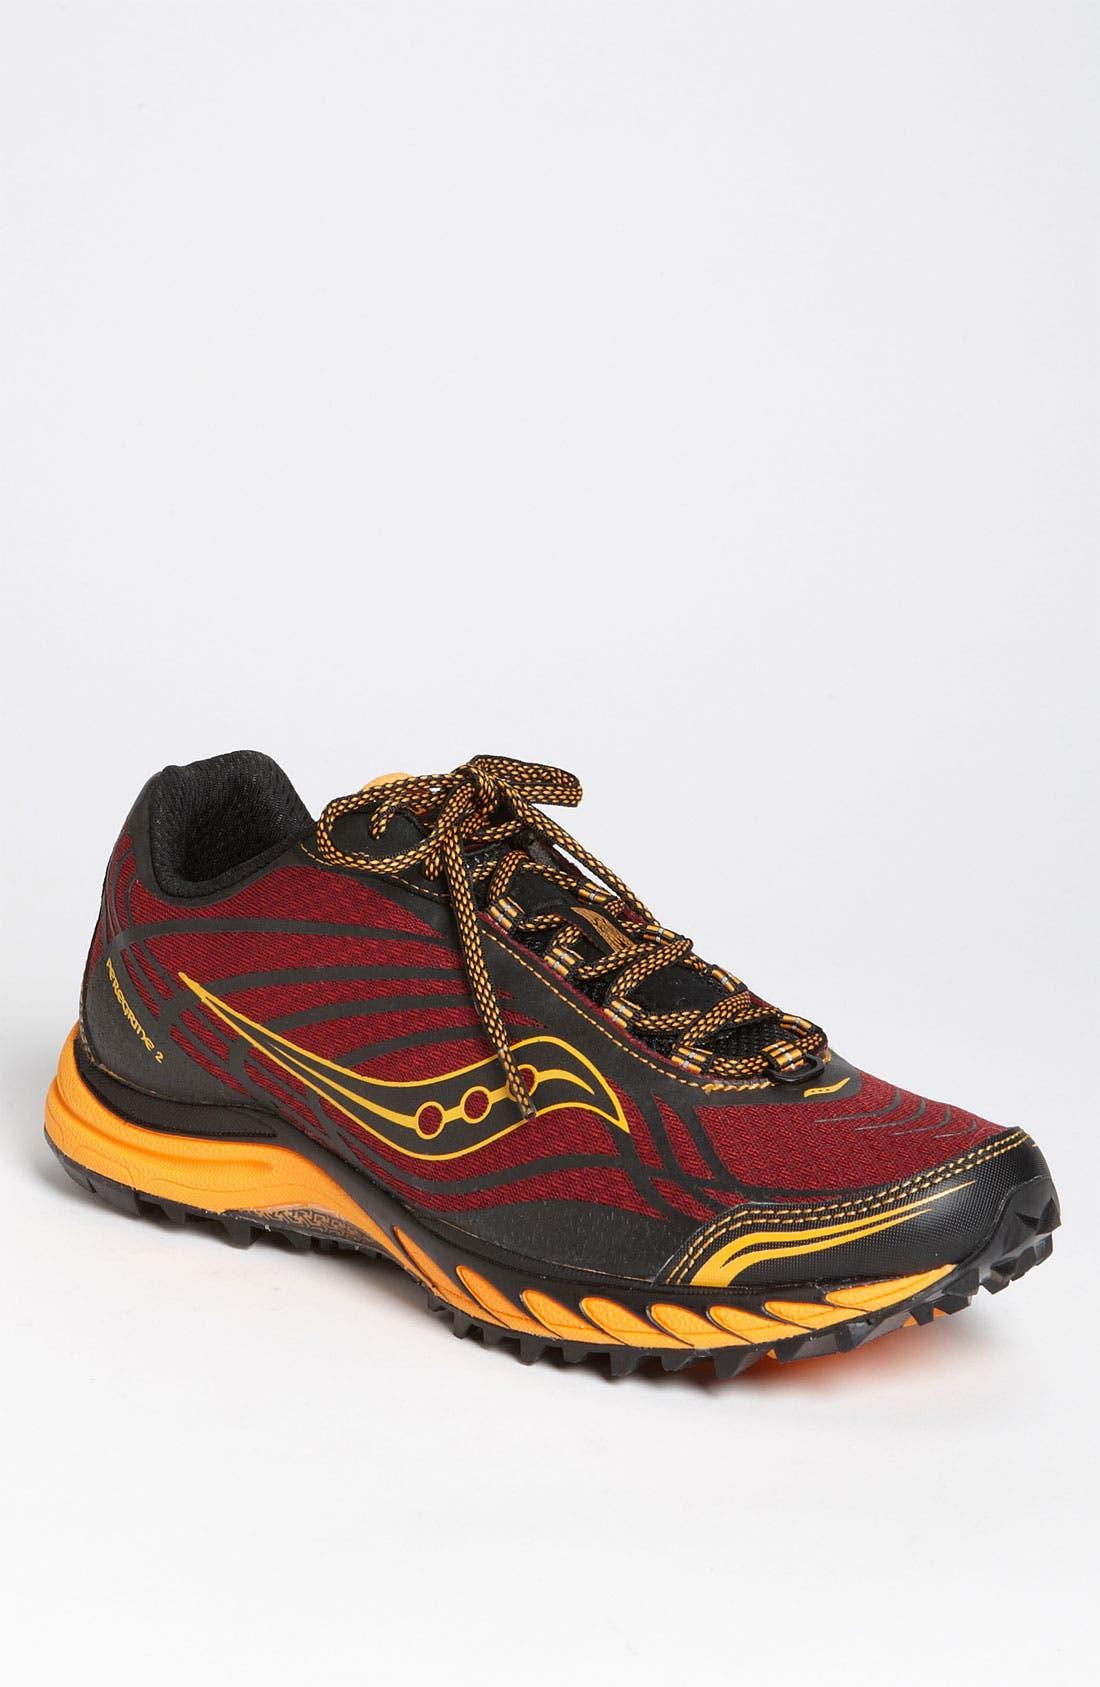 Alternate Image 1 Selected - Saucony 'ProGrid Peregrine 2' Trail Running Shoe (Men)